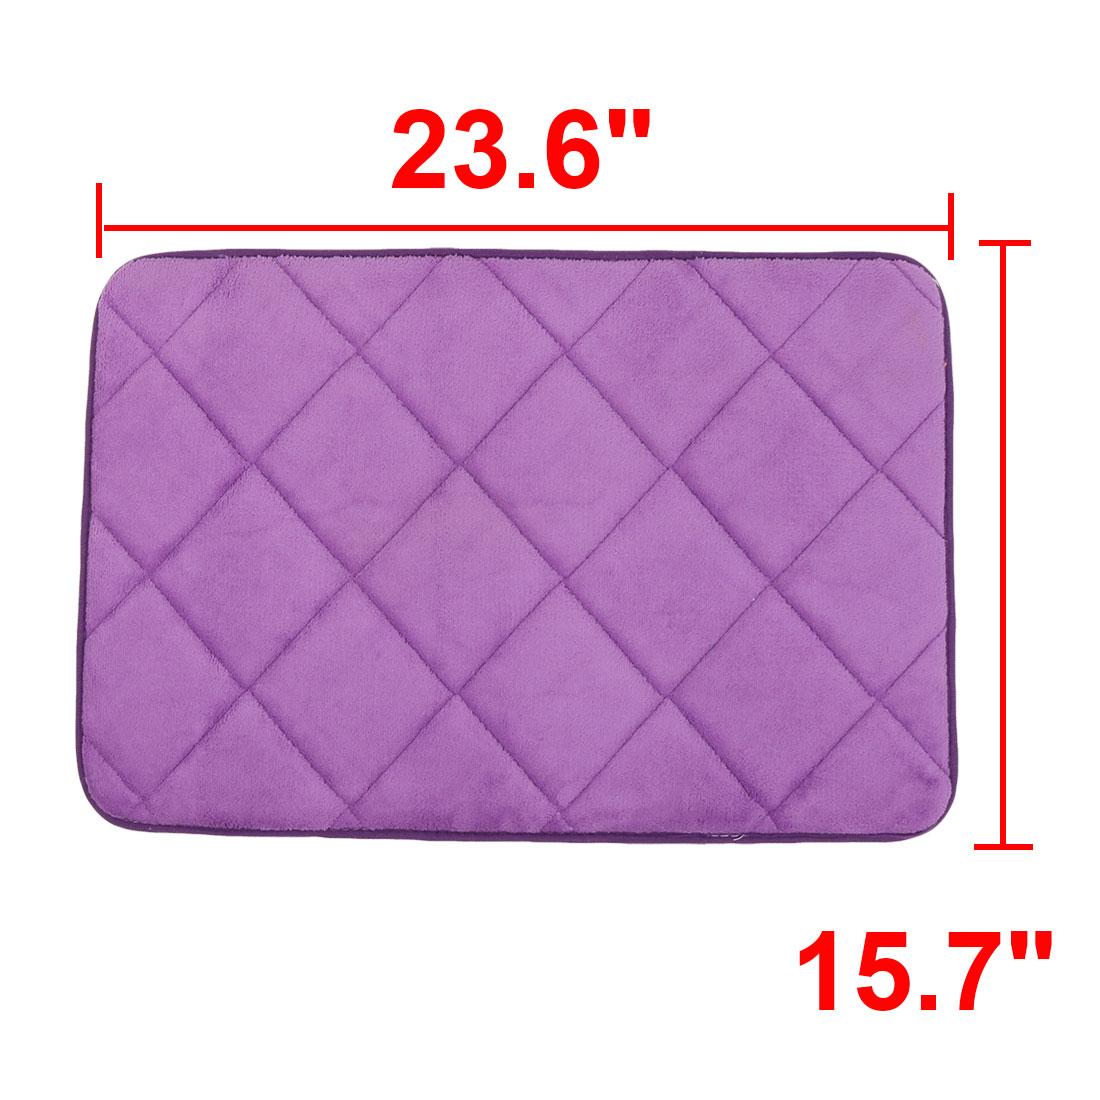 Bathroom Coral Fleece Slip Resistant Washable Floor Rug Carpet Doormat Purple - image 1 de 4